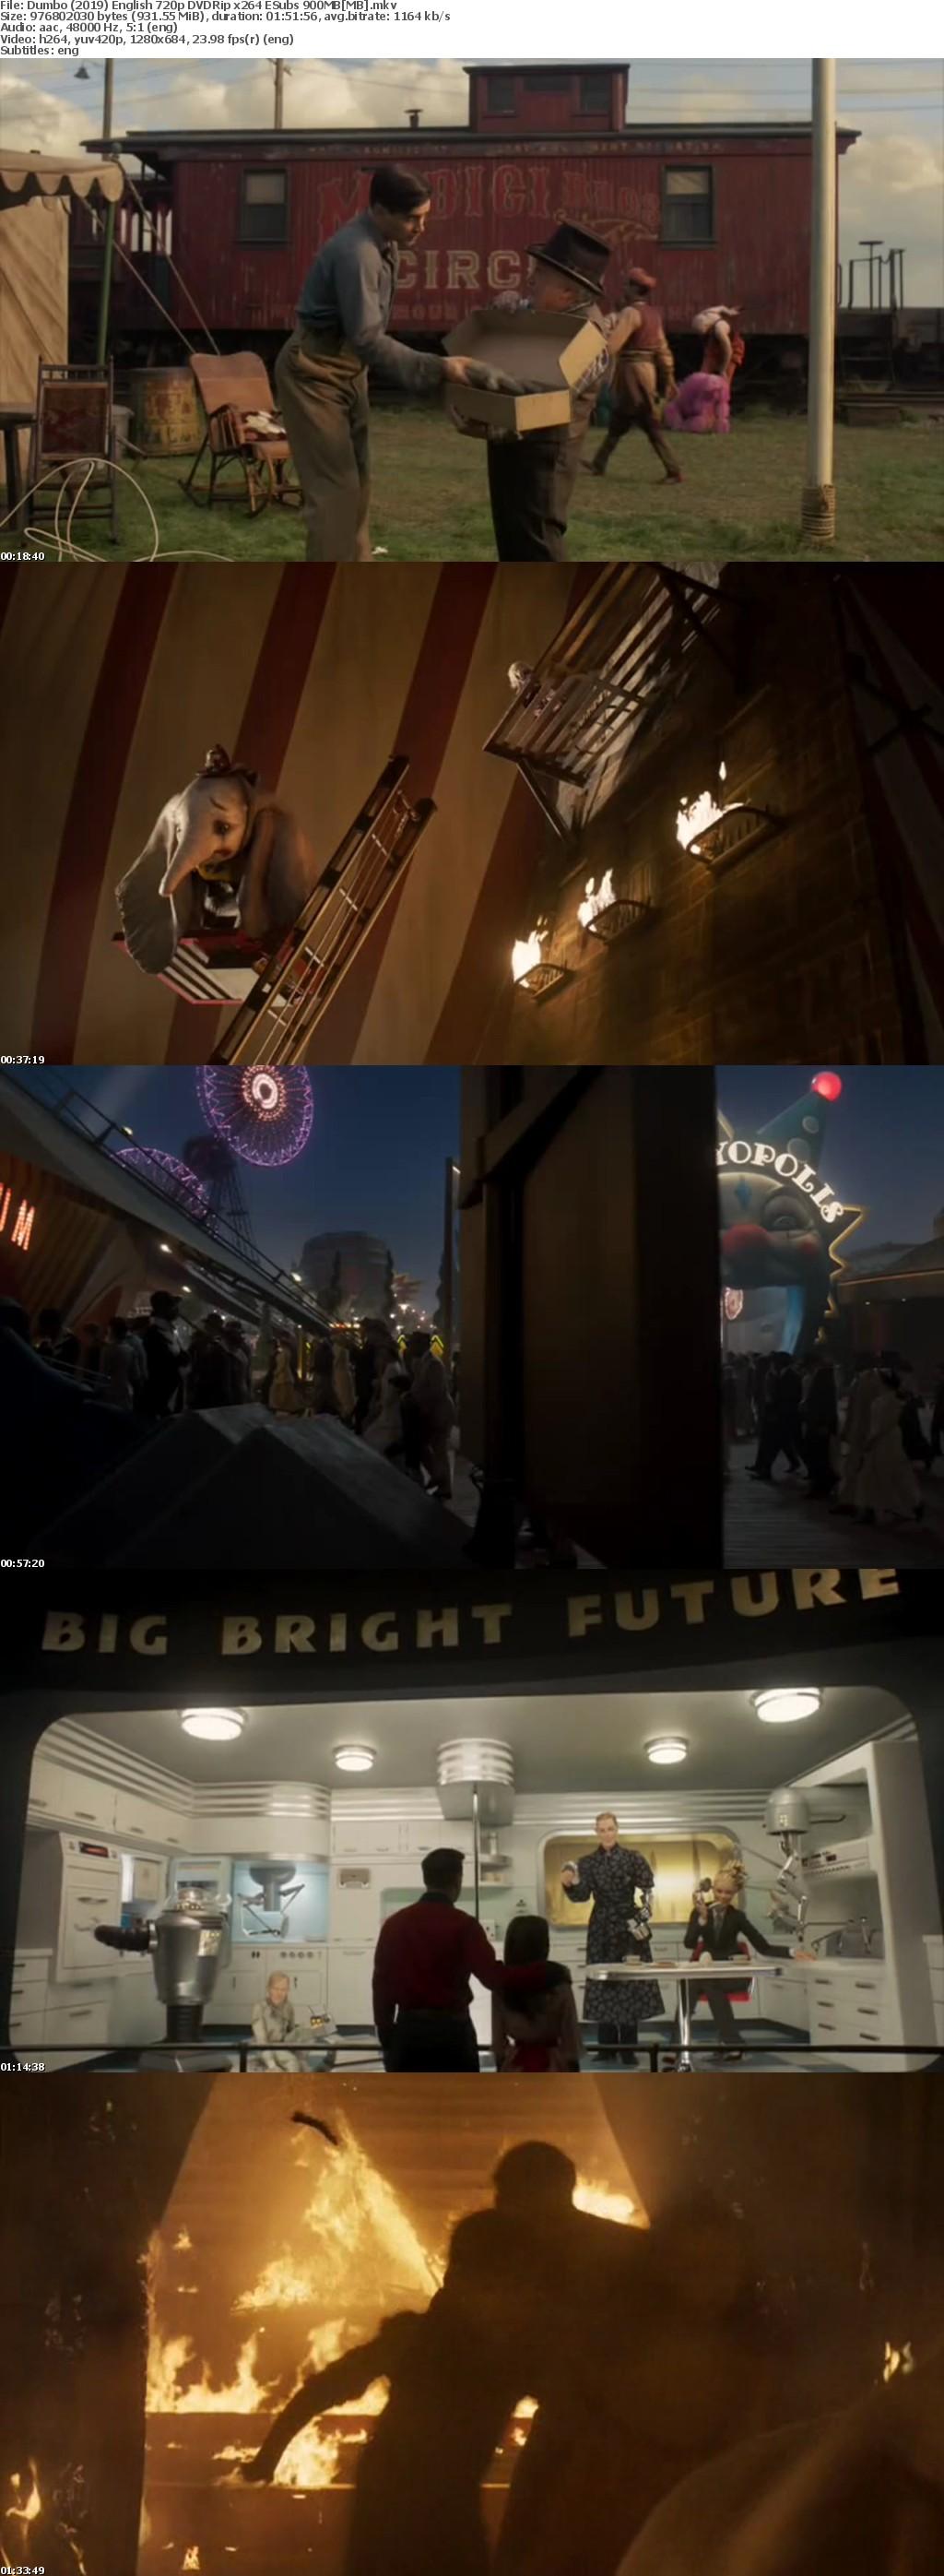 Dumbo 2019 English 720p DVDRip x264 ESubs 900MB[MB]